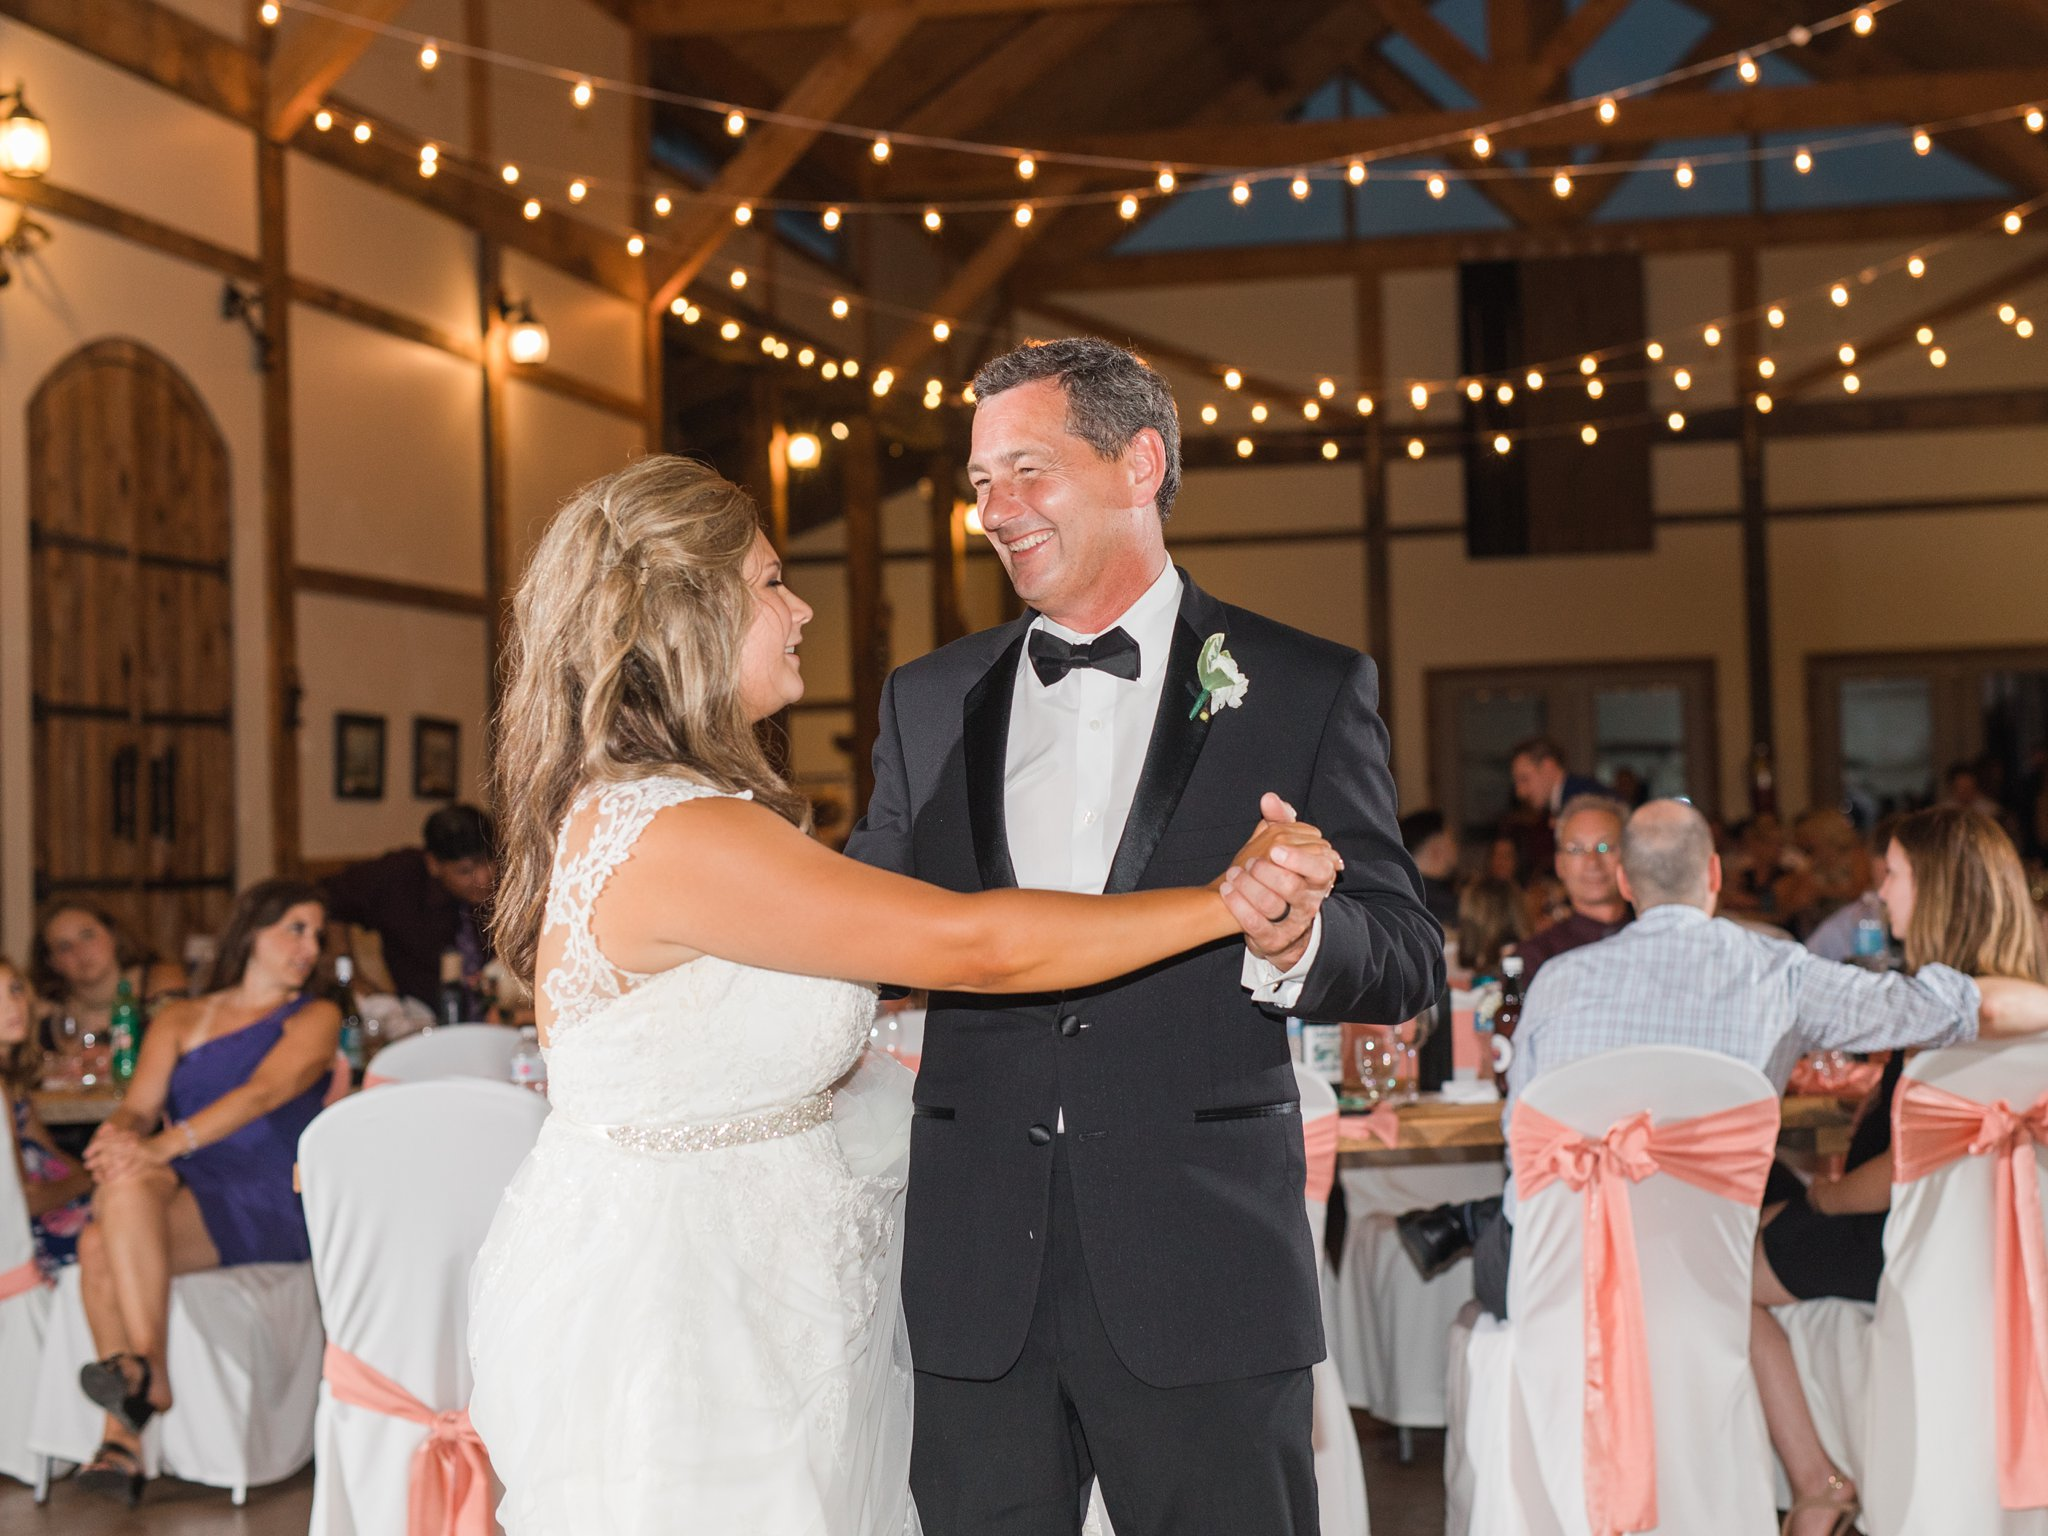 Father-daughter dance Vineyard wedding at Jabulani Amy Pinder Photography